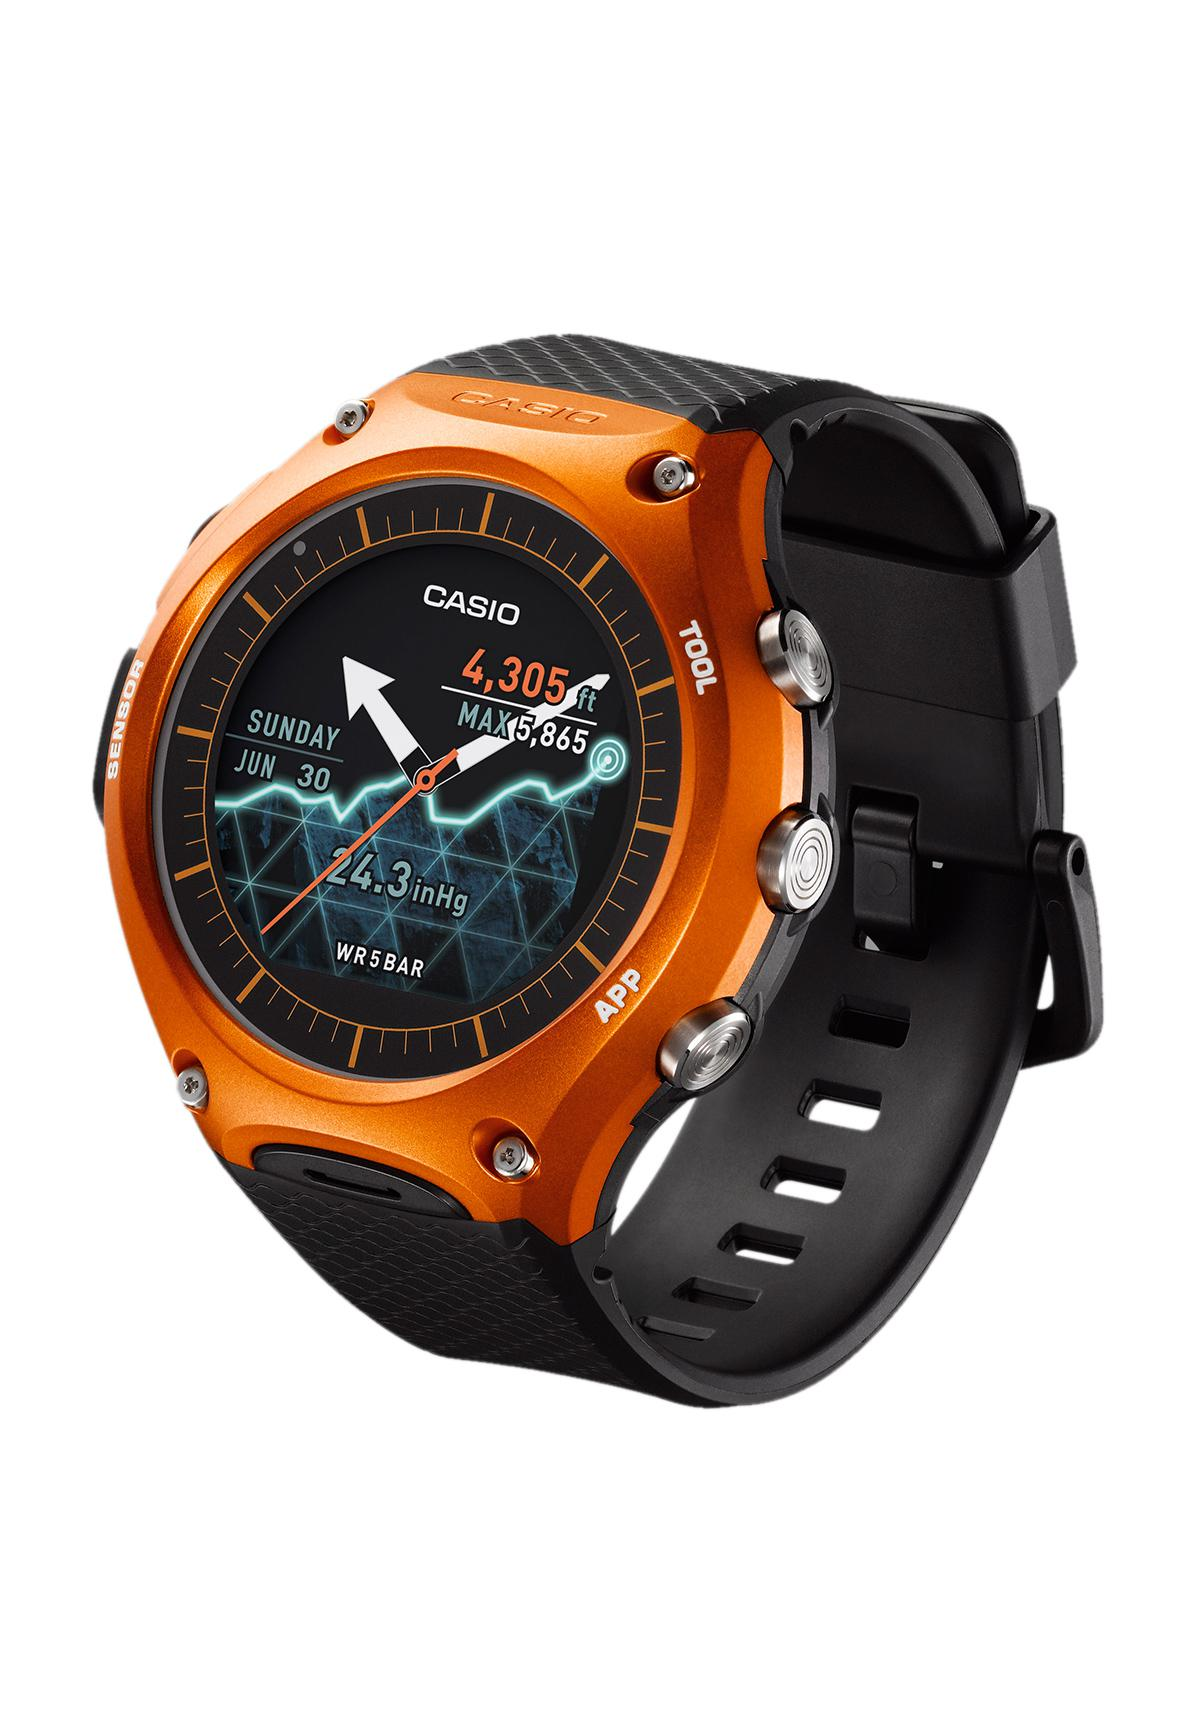 casio smart outdoor watch wsd f10rgbae nur 399 00. Black Bedroom Furniture Sets. Home Design Ideas